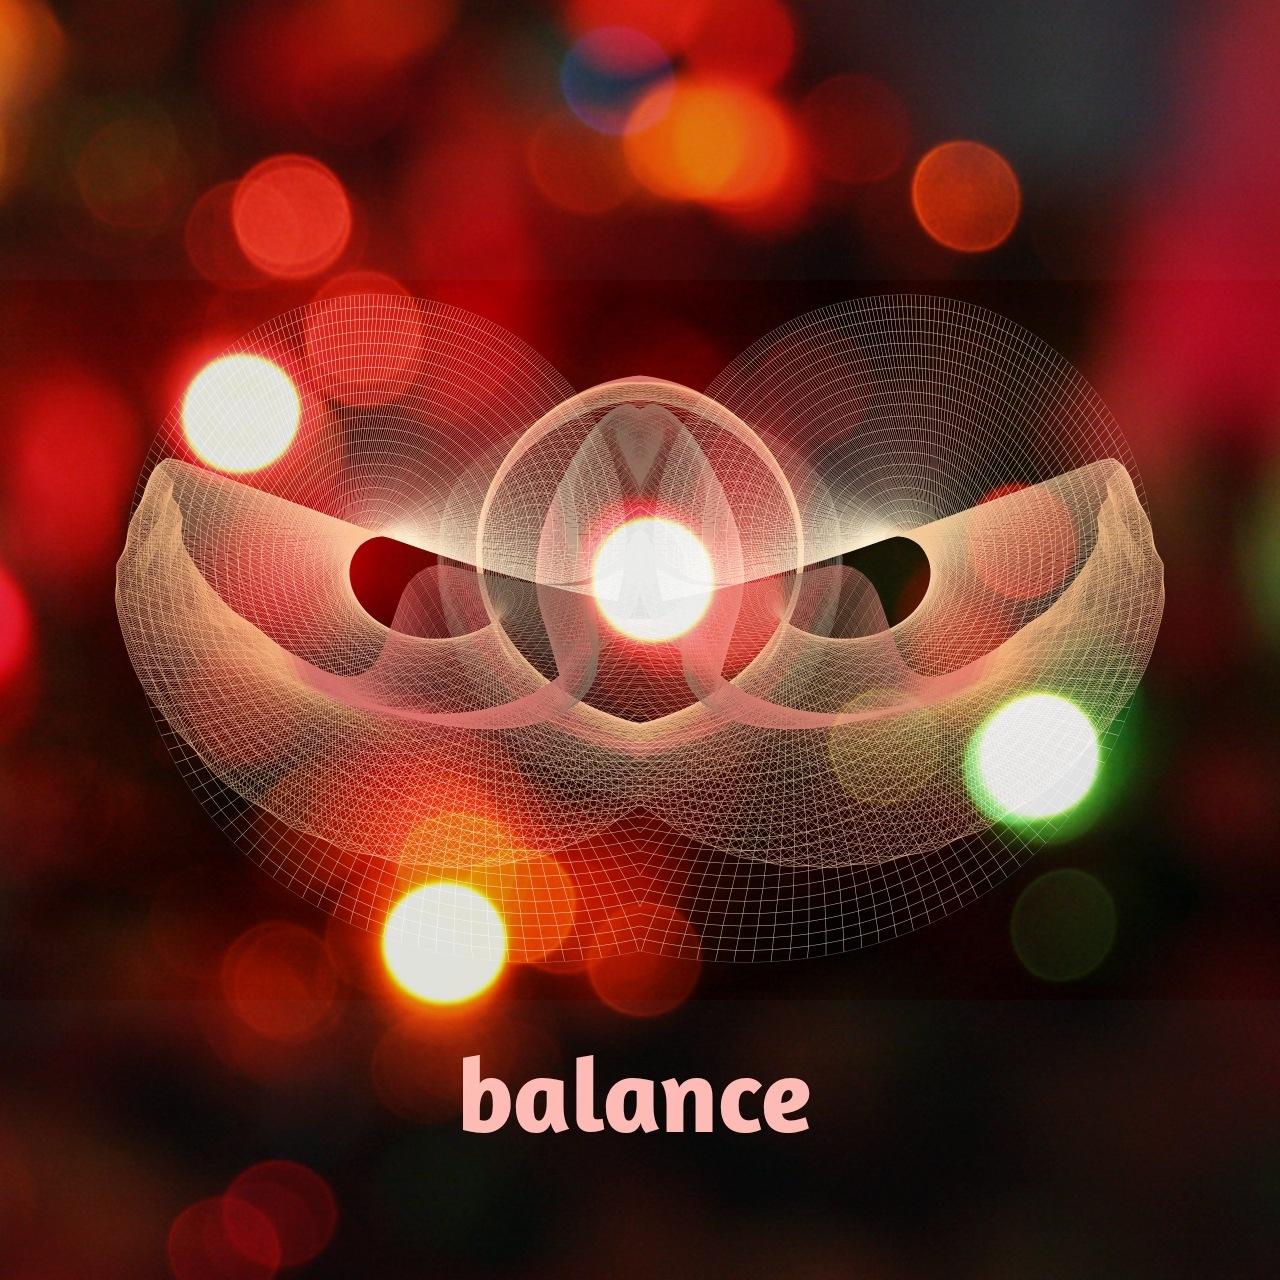 balance by heartlady